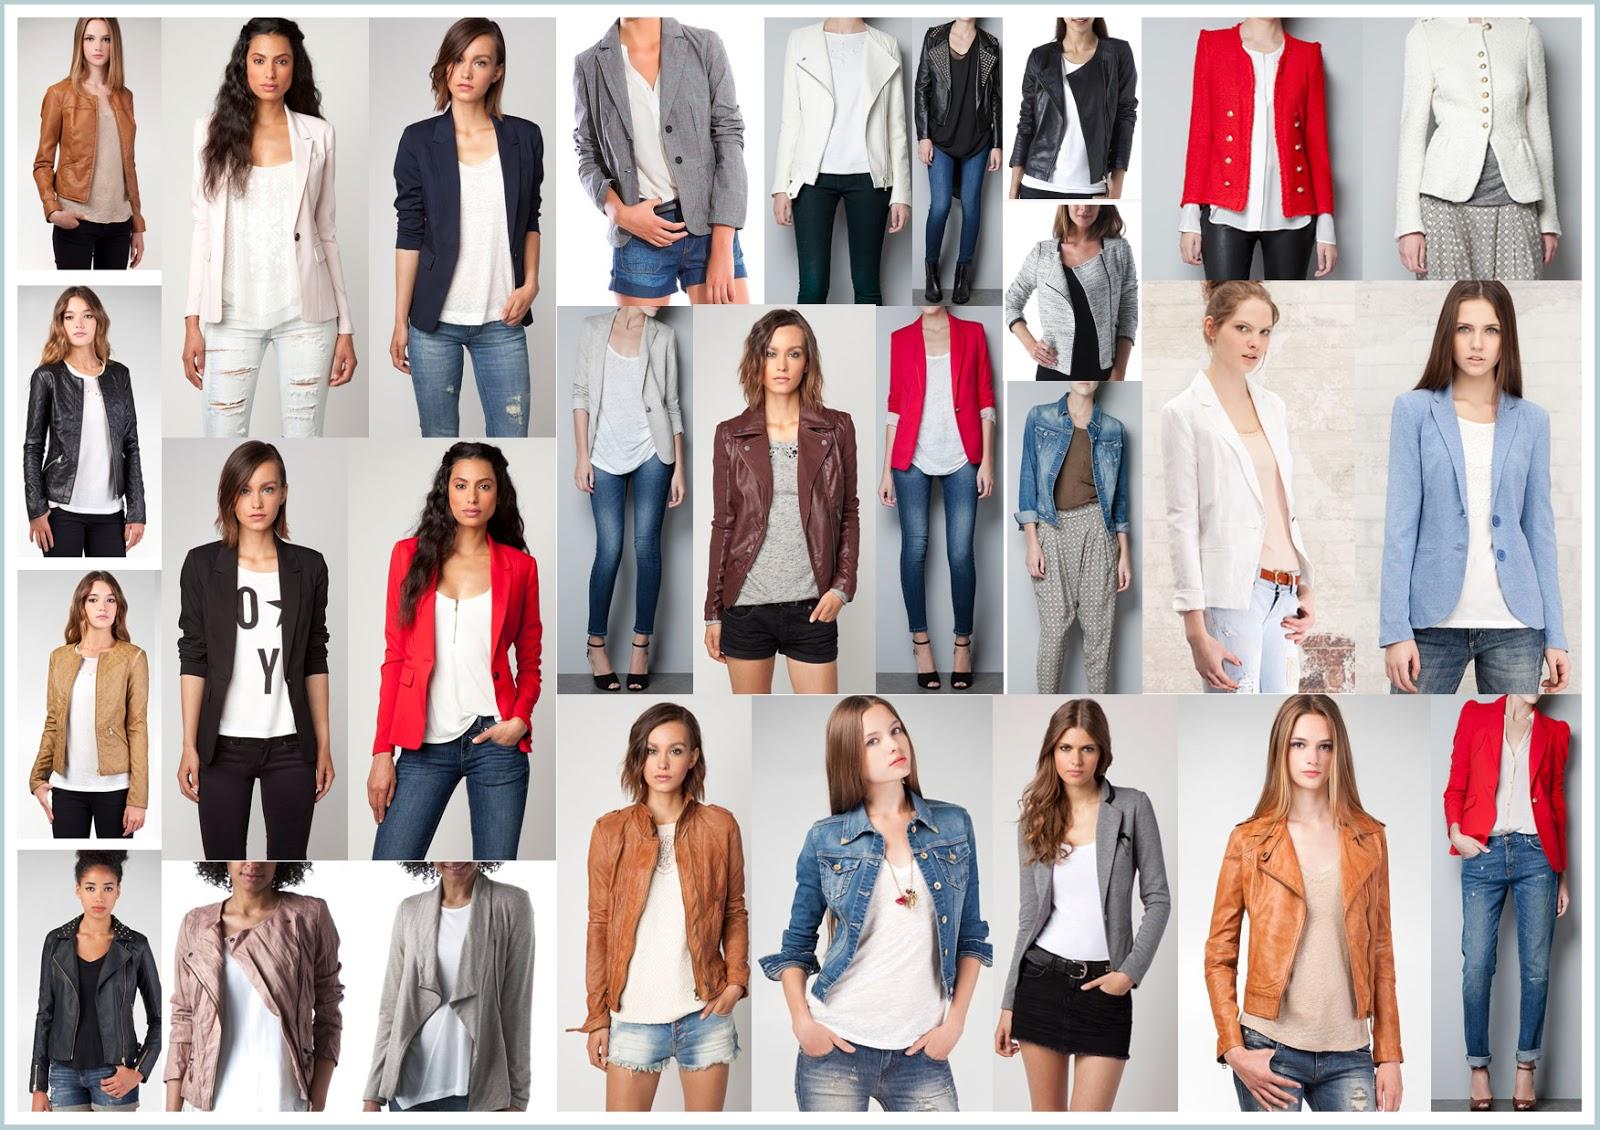 Moda complementos online moda actual - La moda de otono ...